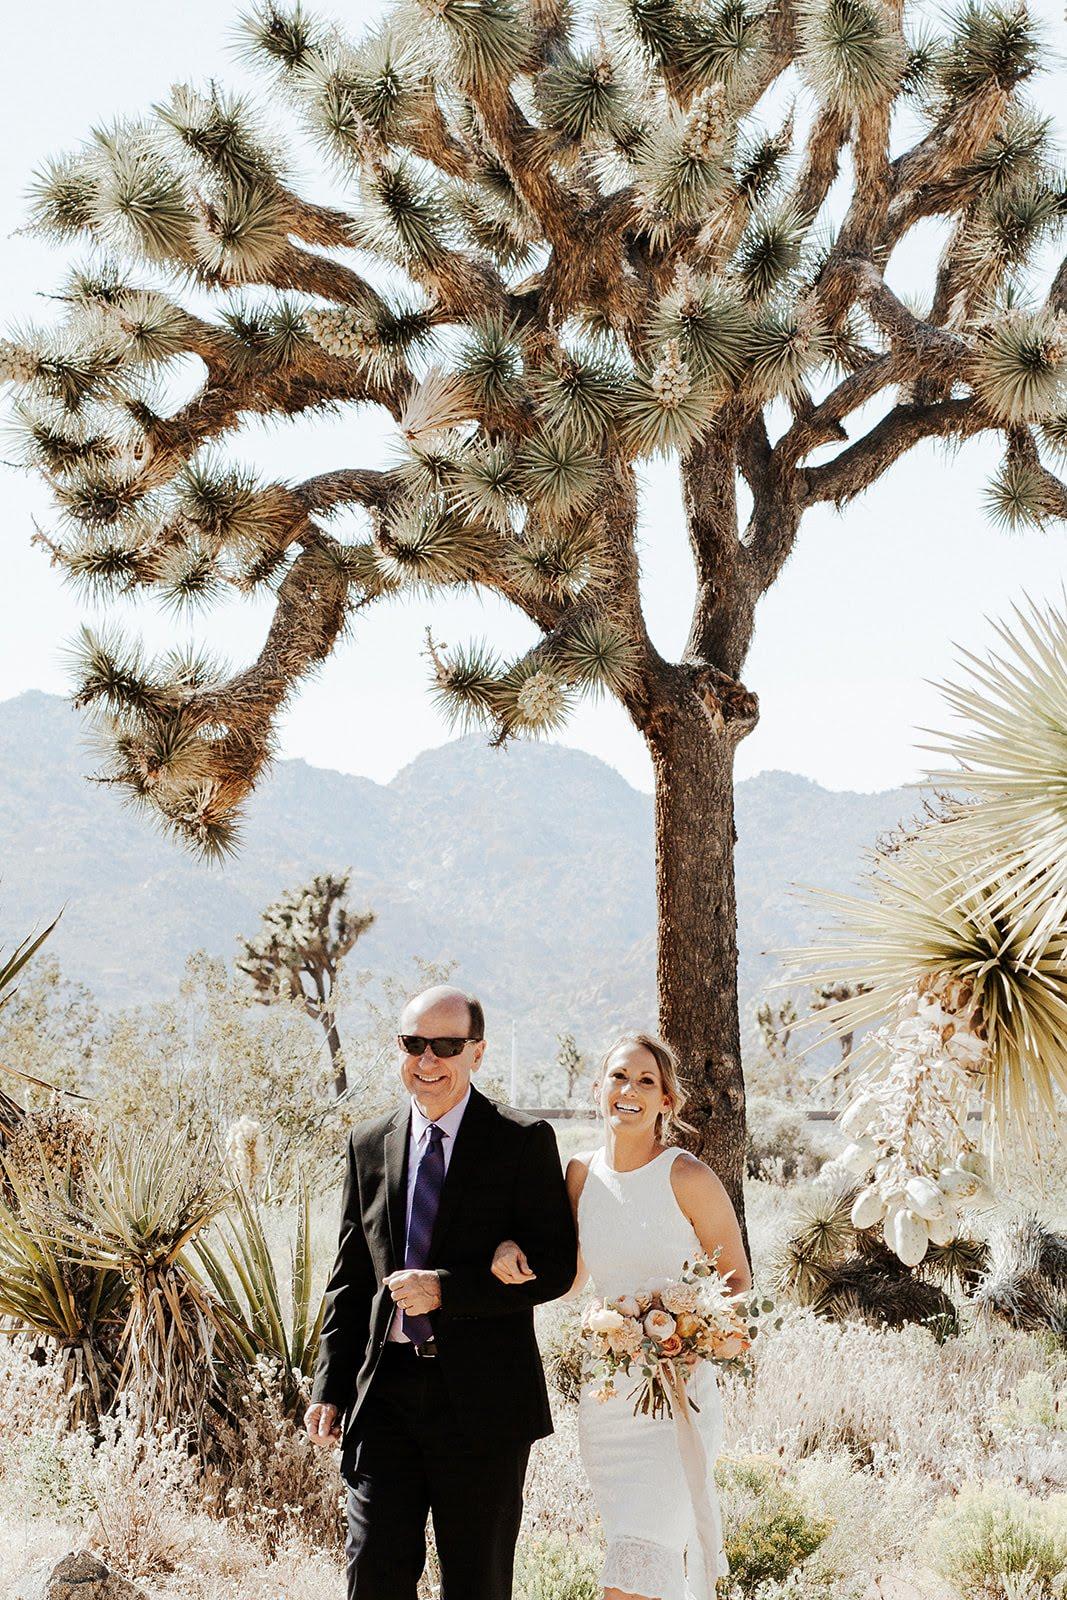 darianshantay_jess_kevry_wedding-196.jpg